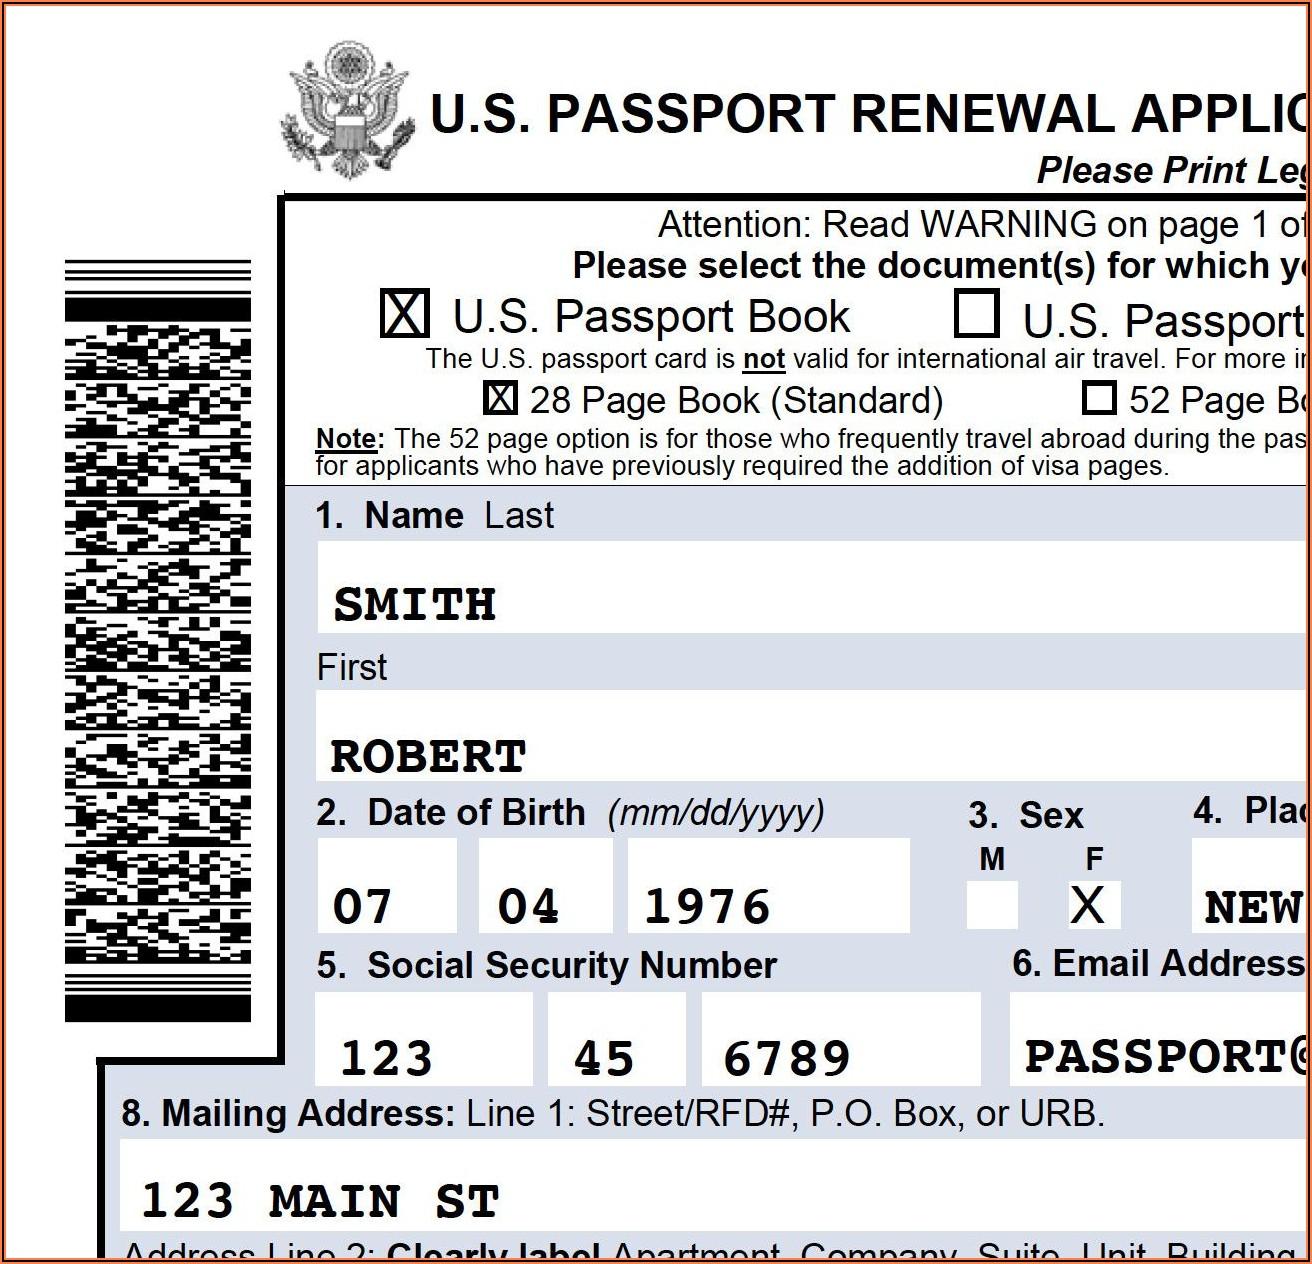 Passport Renewal Form Ds 82